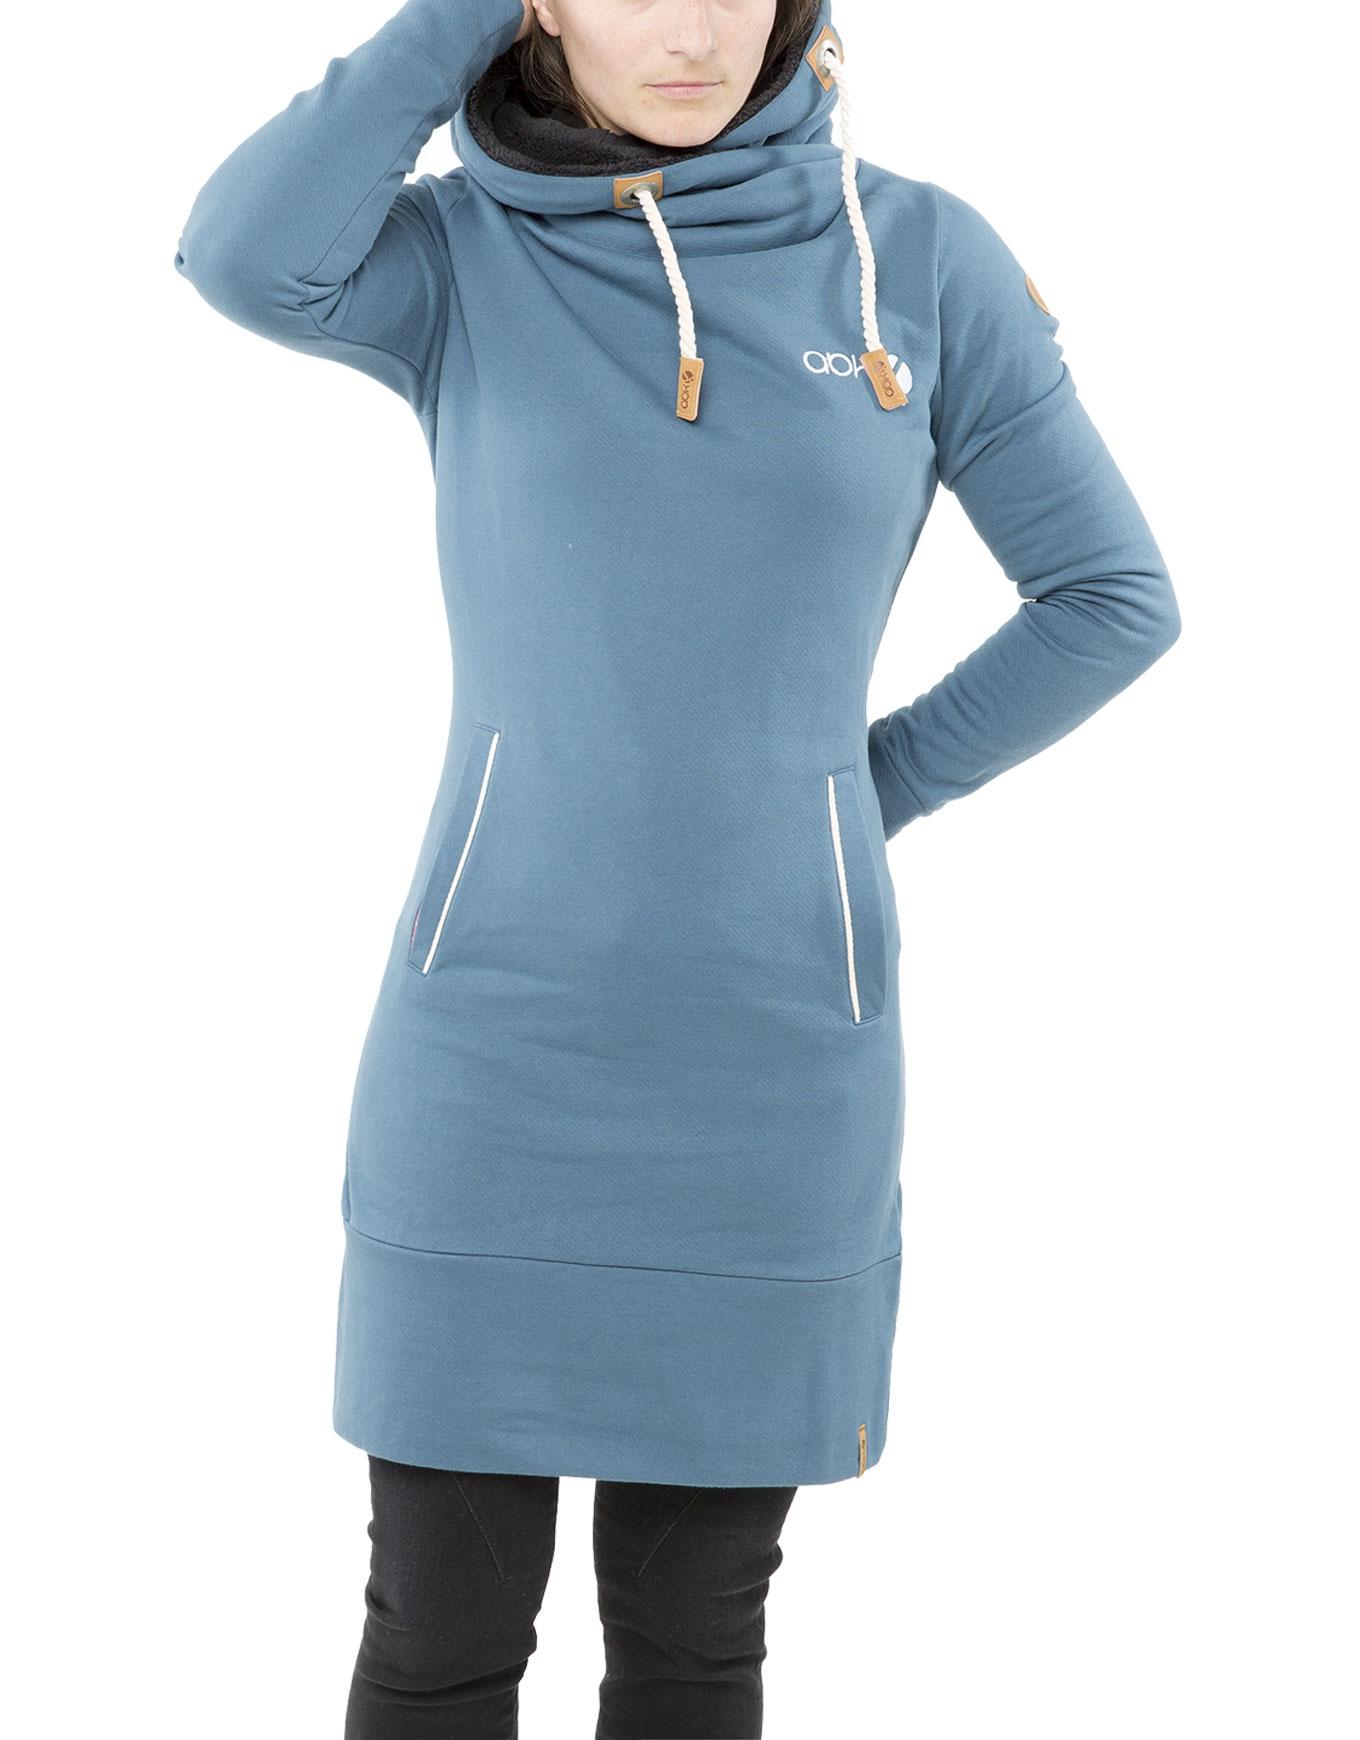 Gaun Dress Hoodie W Blue Grey